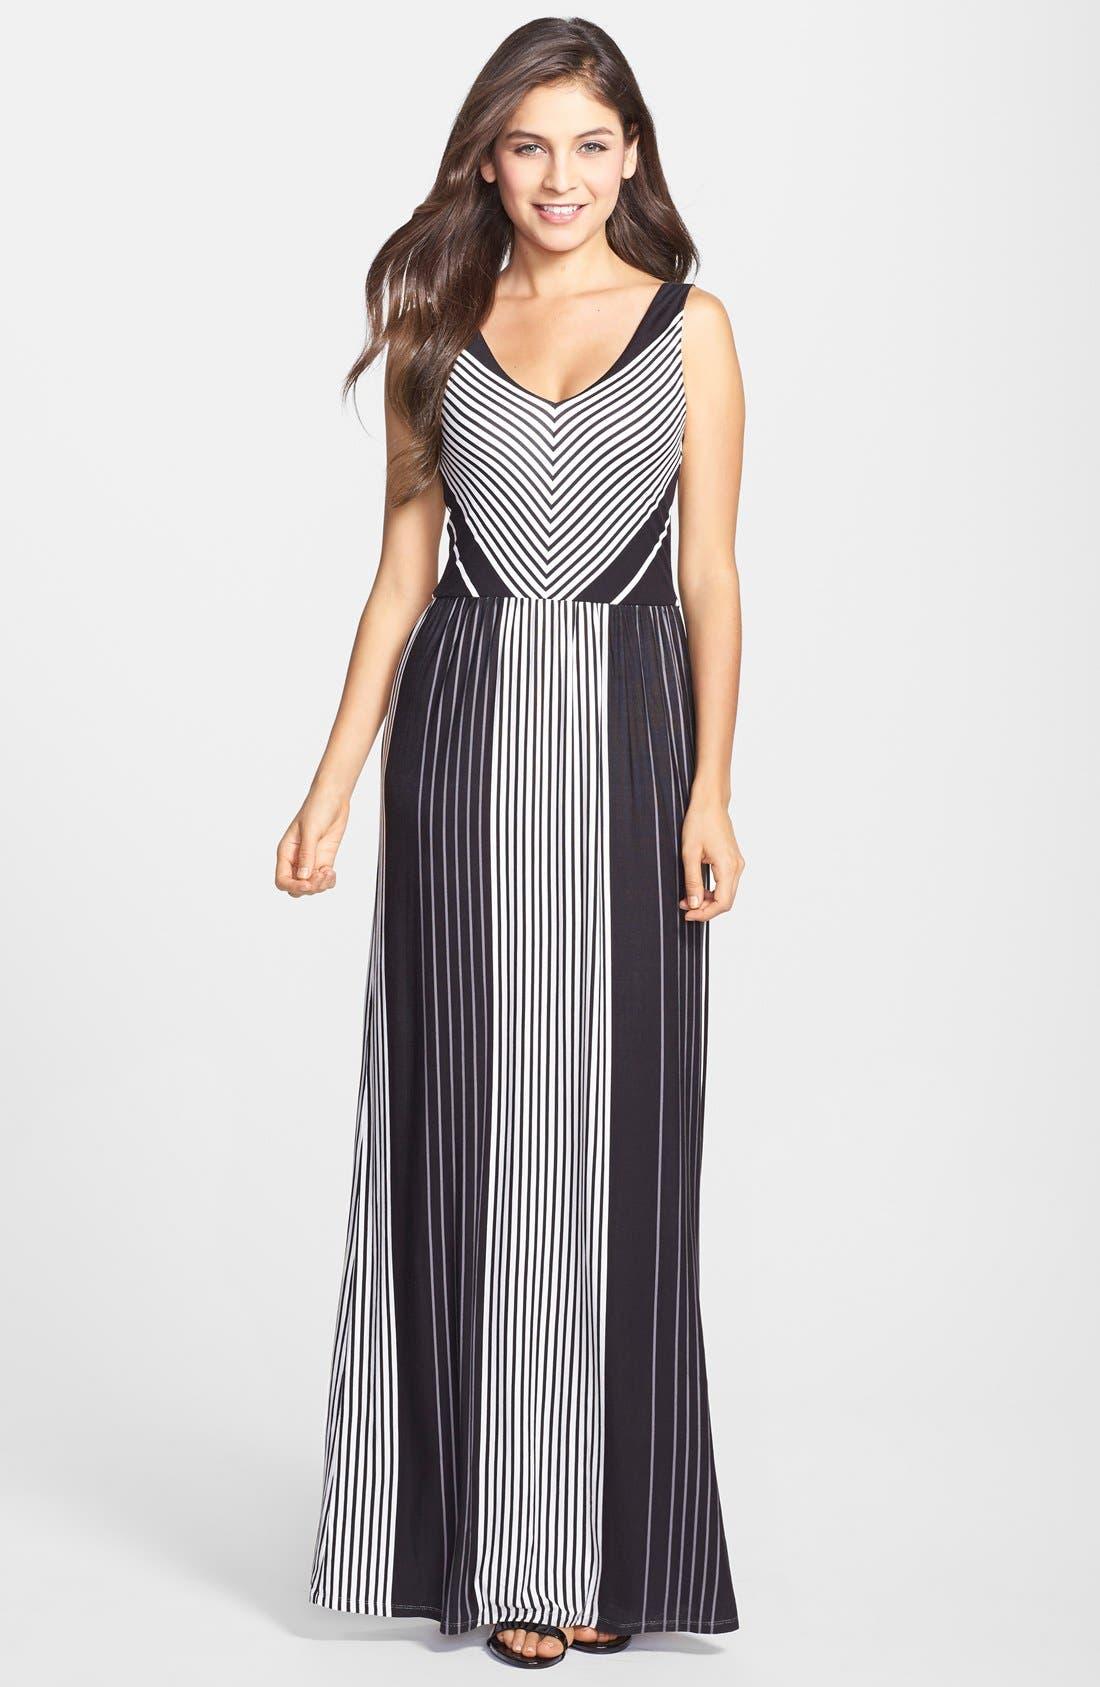 Alternate Image 1 Selected - Felicity & Coco Stripe V-Neck Maxi Dress (Regular & Petite) (Nordstrom Exclusive)